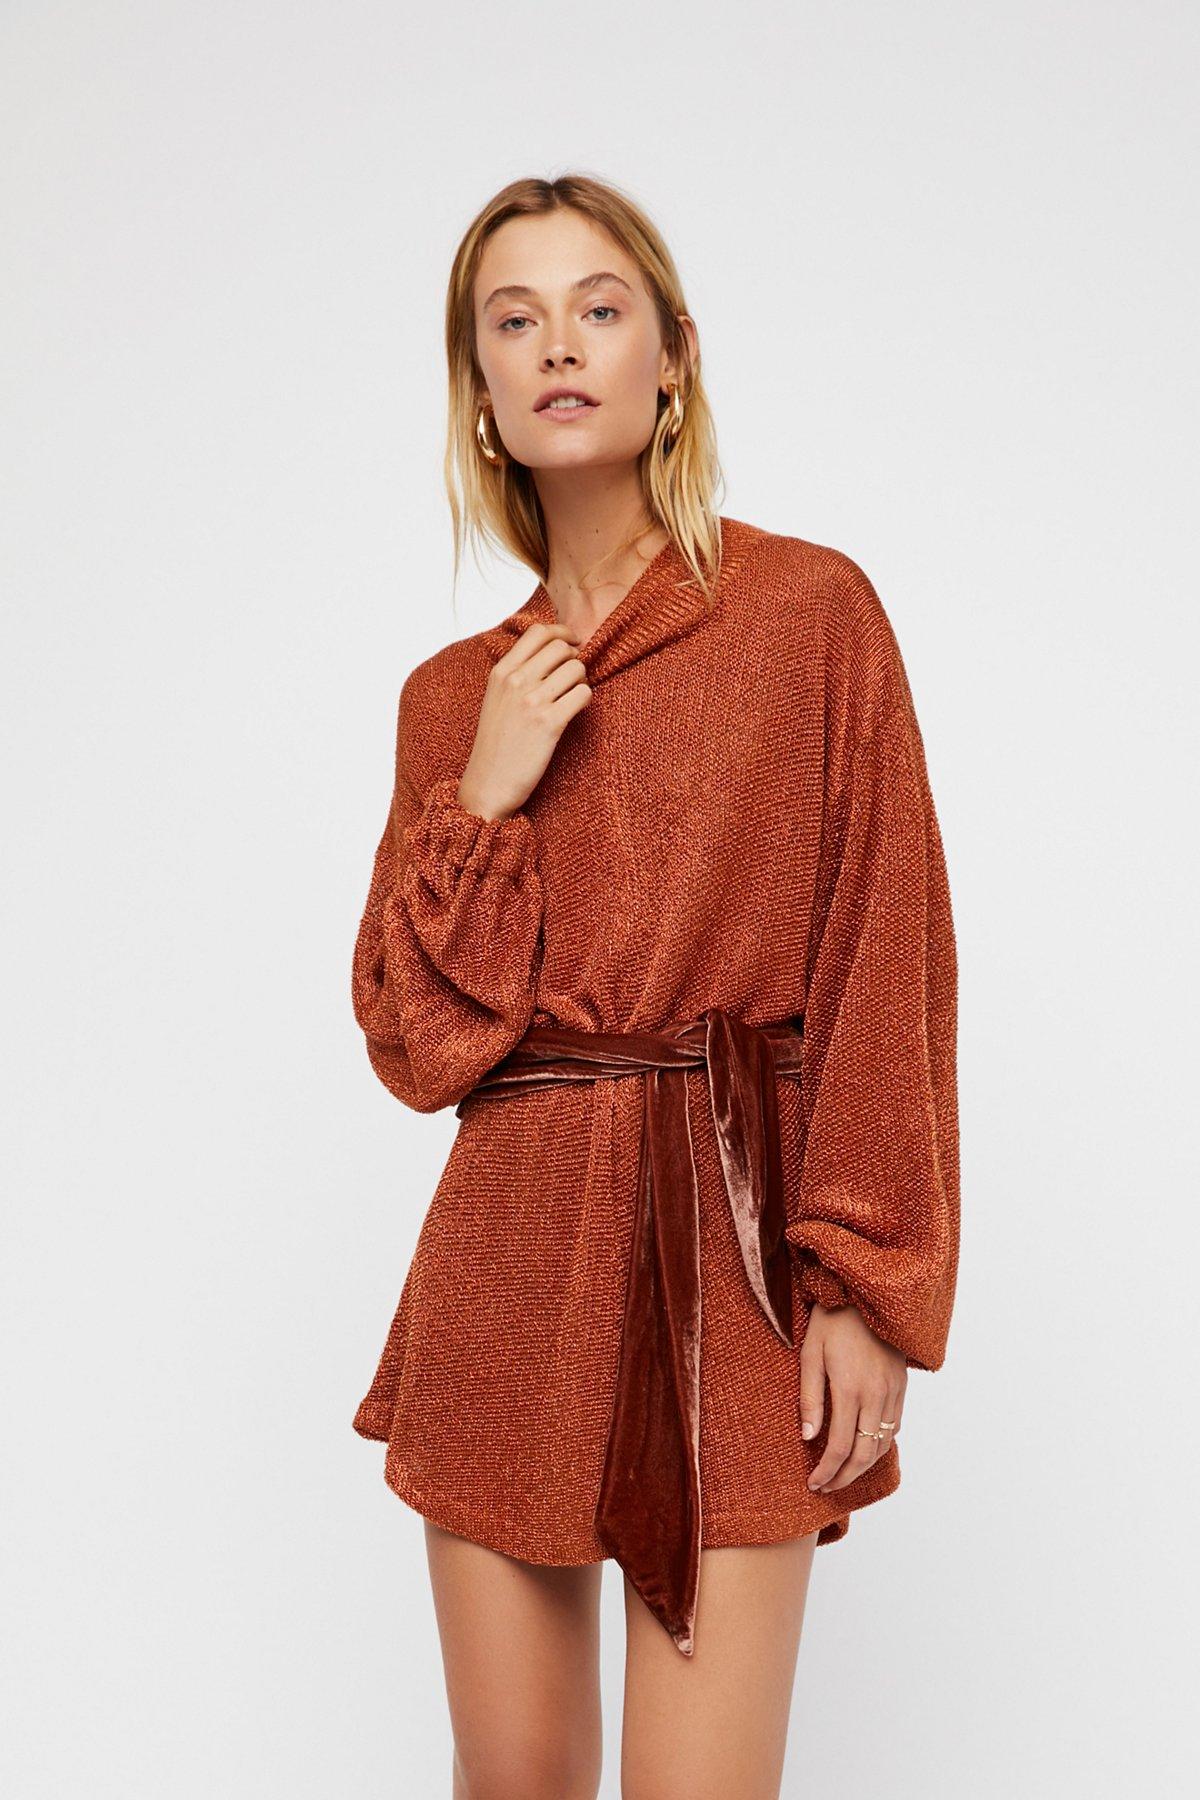 Fete毛线连衣裙